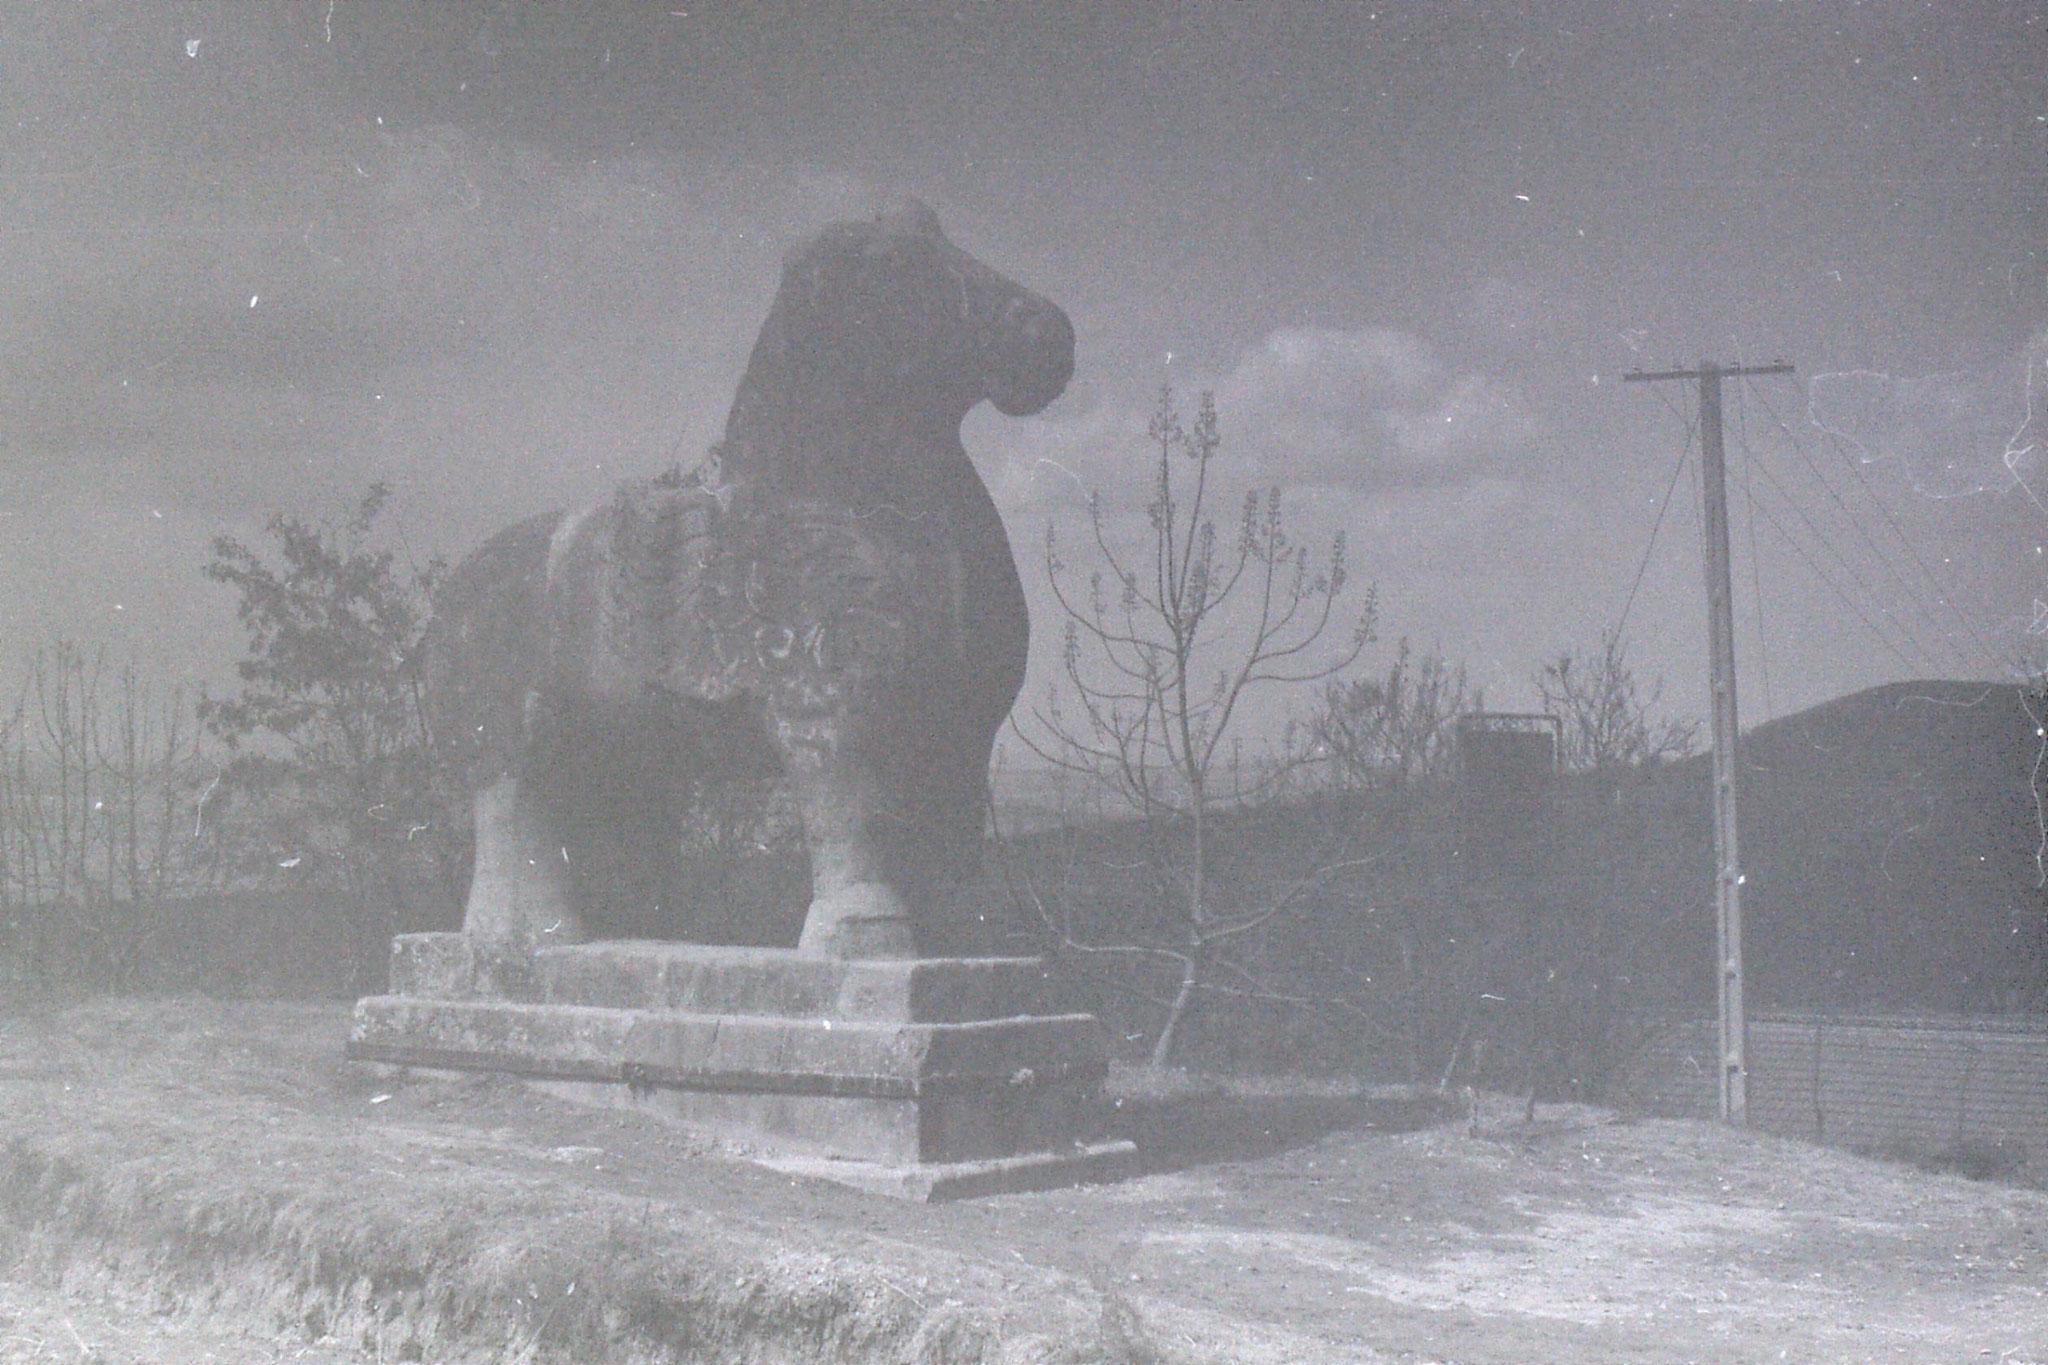 7/3/1989: 24: Xianyang stone winged horses